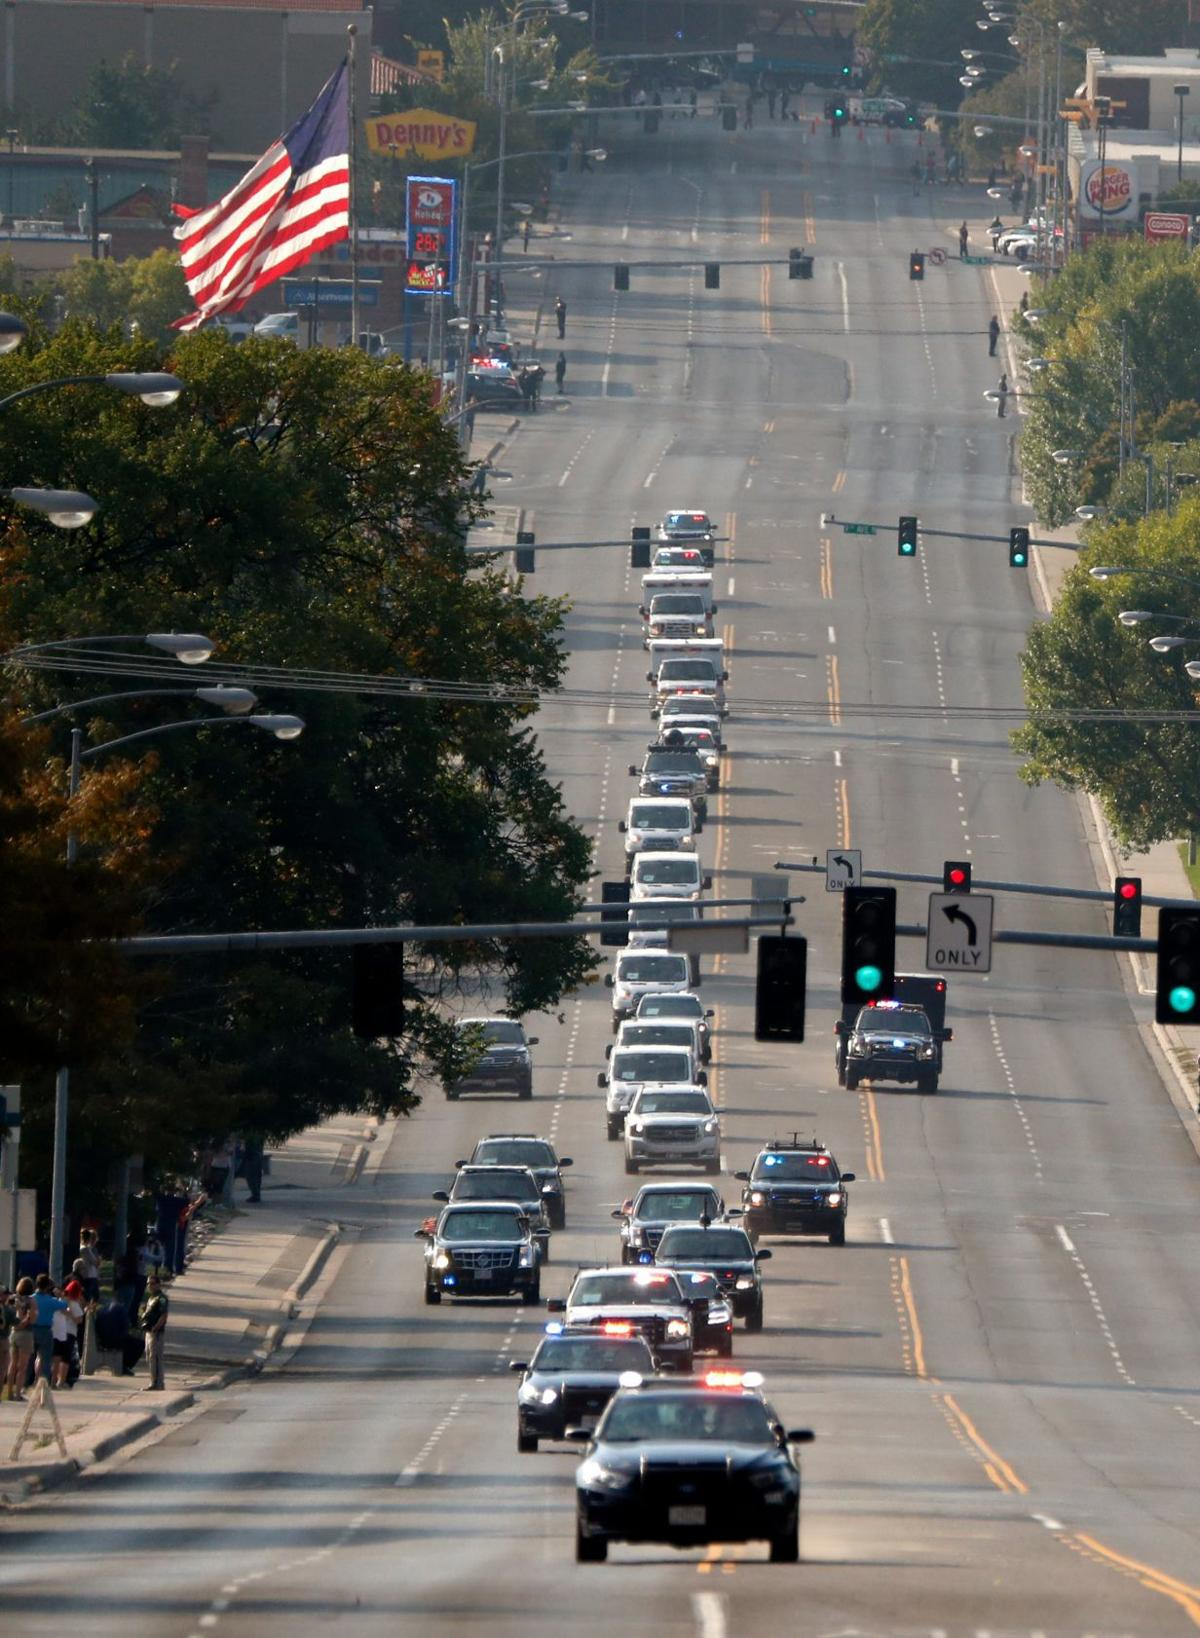 The Presidential motorcade